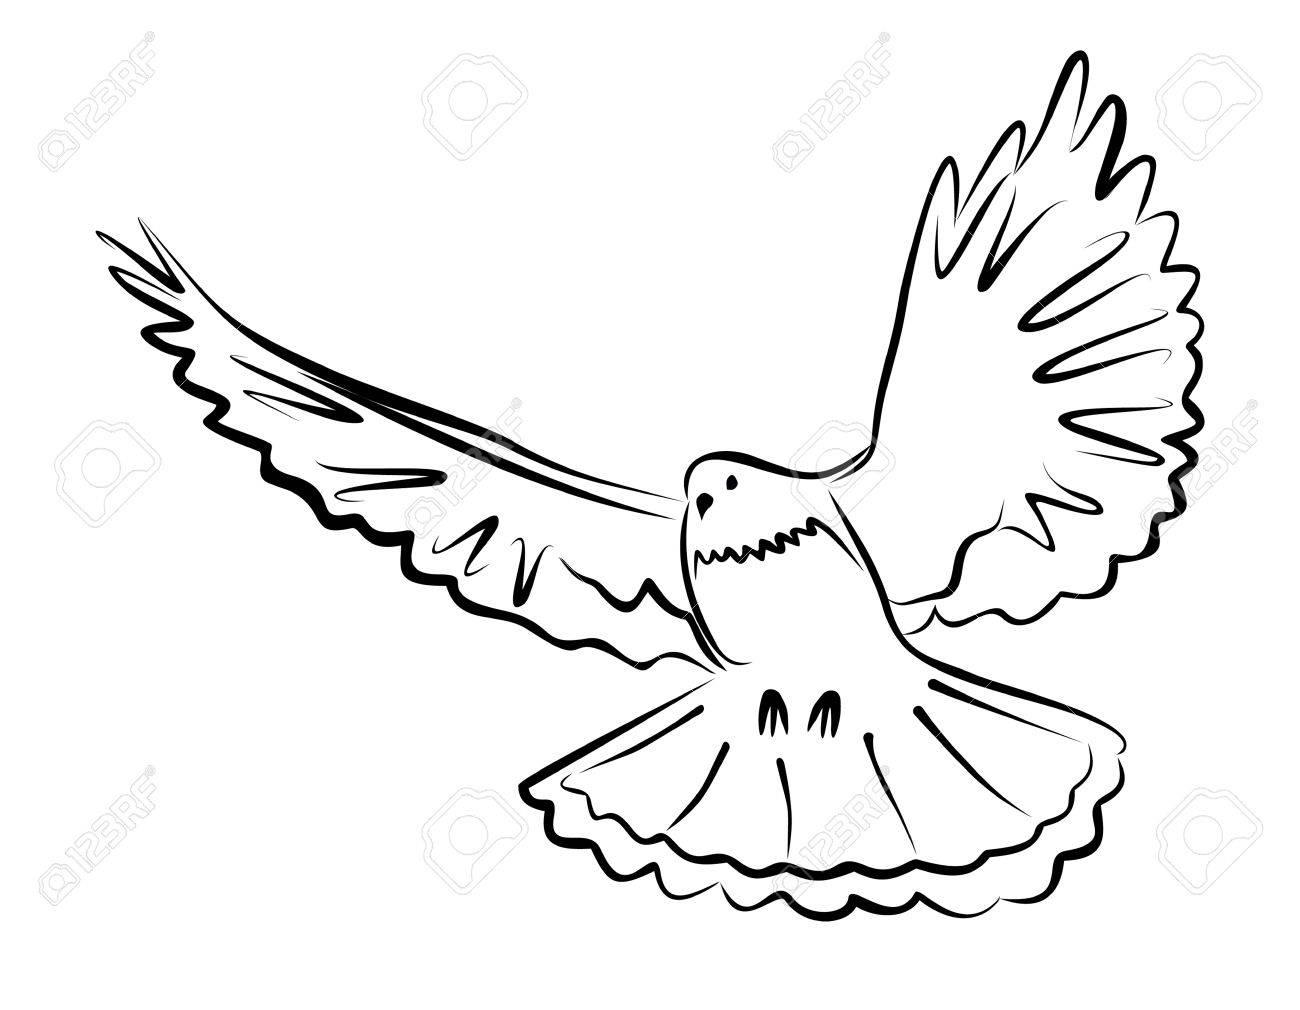 simple dove drawing at getdrawings com